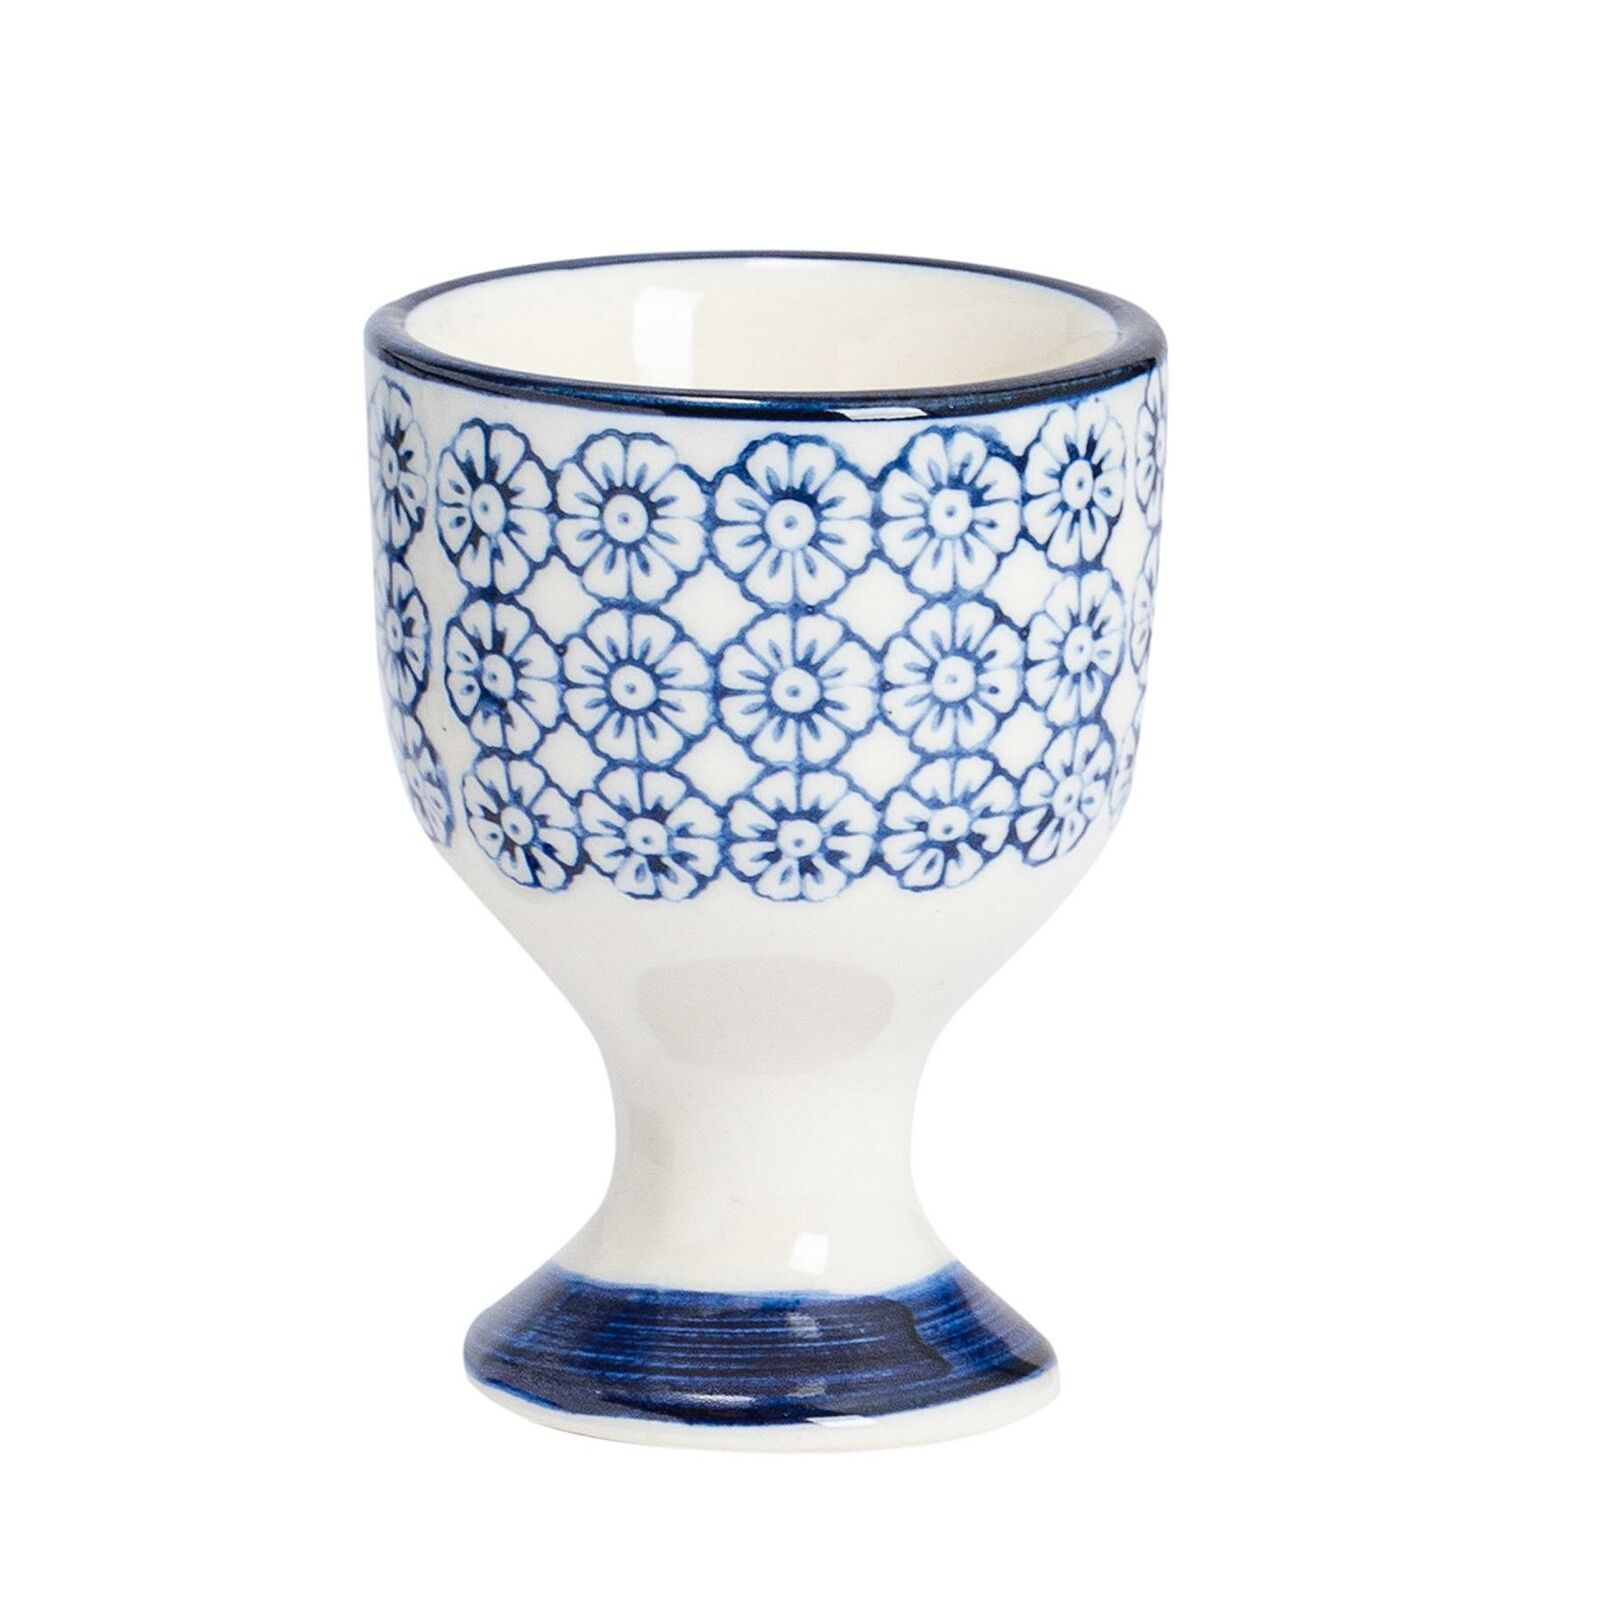 Polka Splodge Egg Cup Shabby Chic Spotty Spring Home Decor Tableware Gift